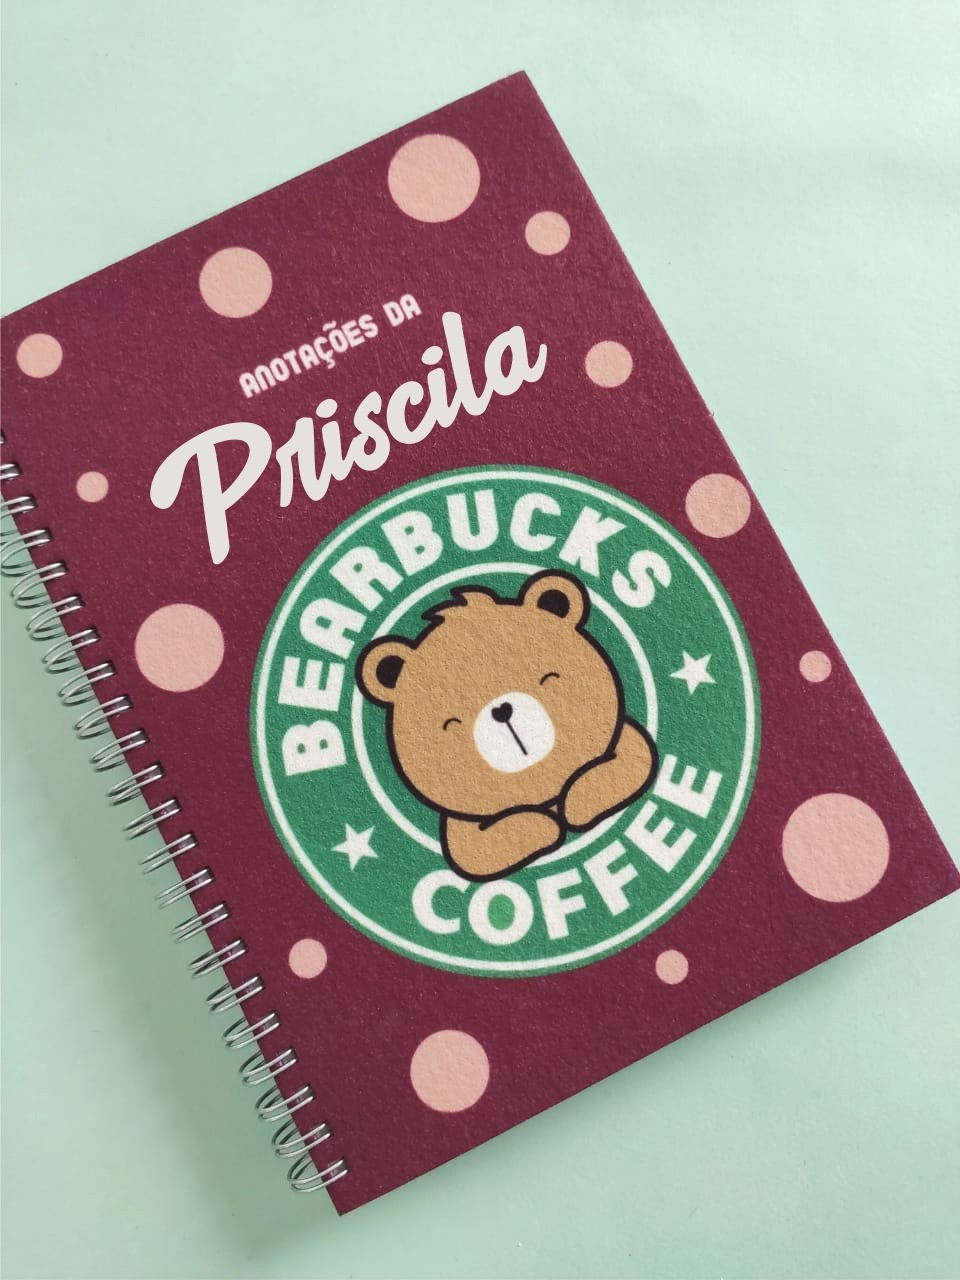 Caderno Bearbucks Coffee Personalizada com Nome